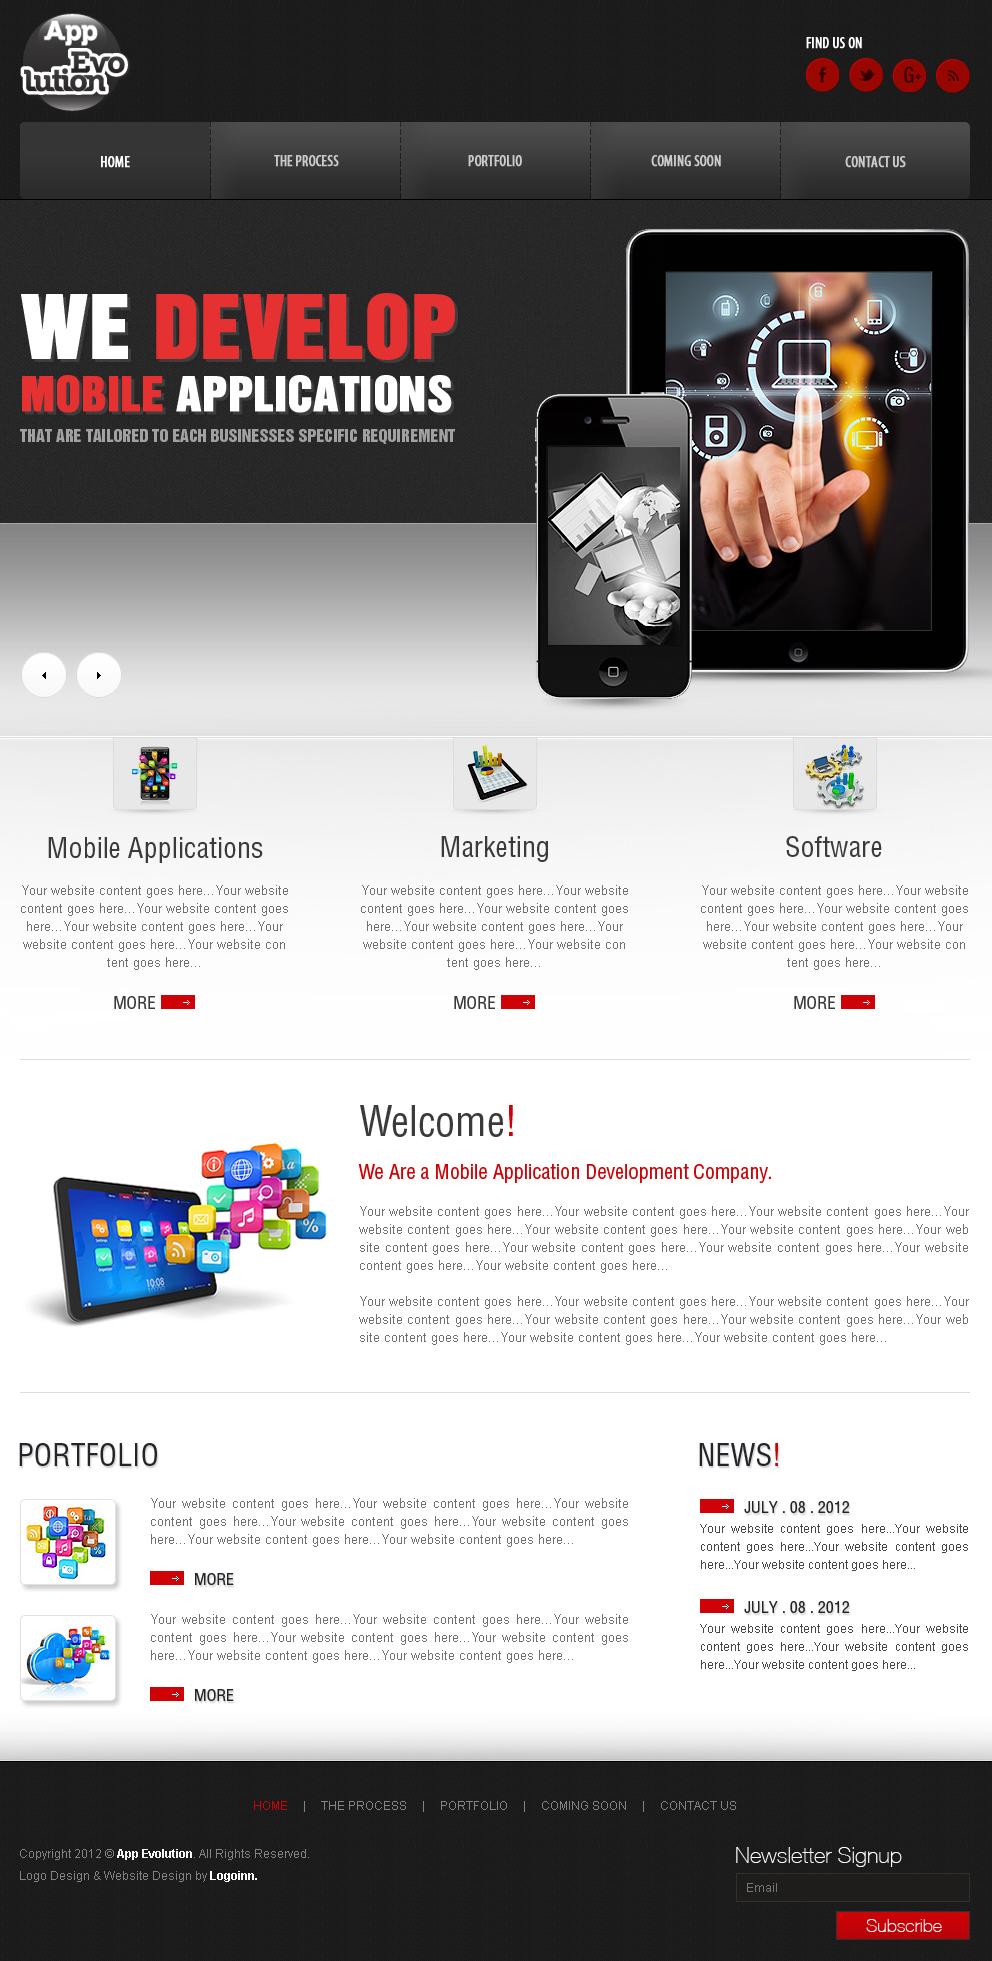 Cheap Custom Professional Website Design Service - $99